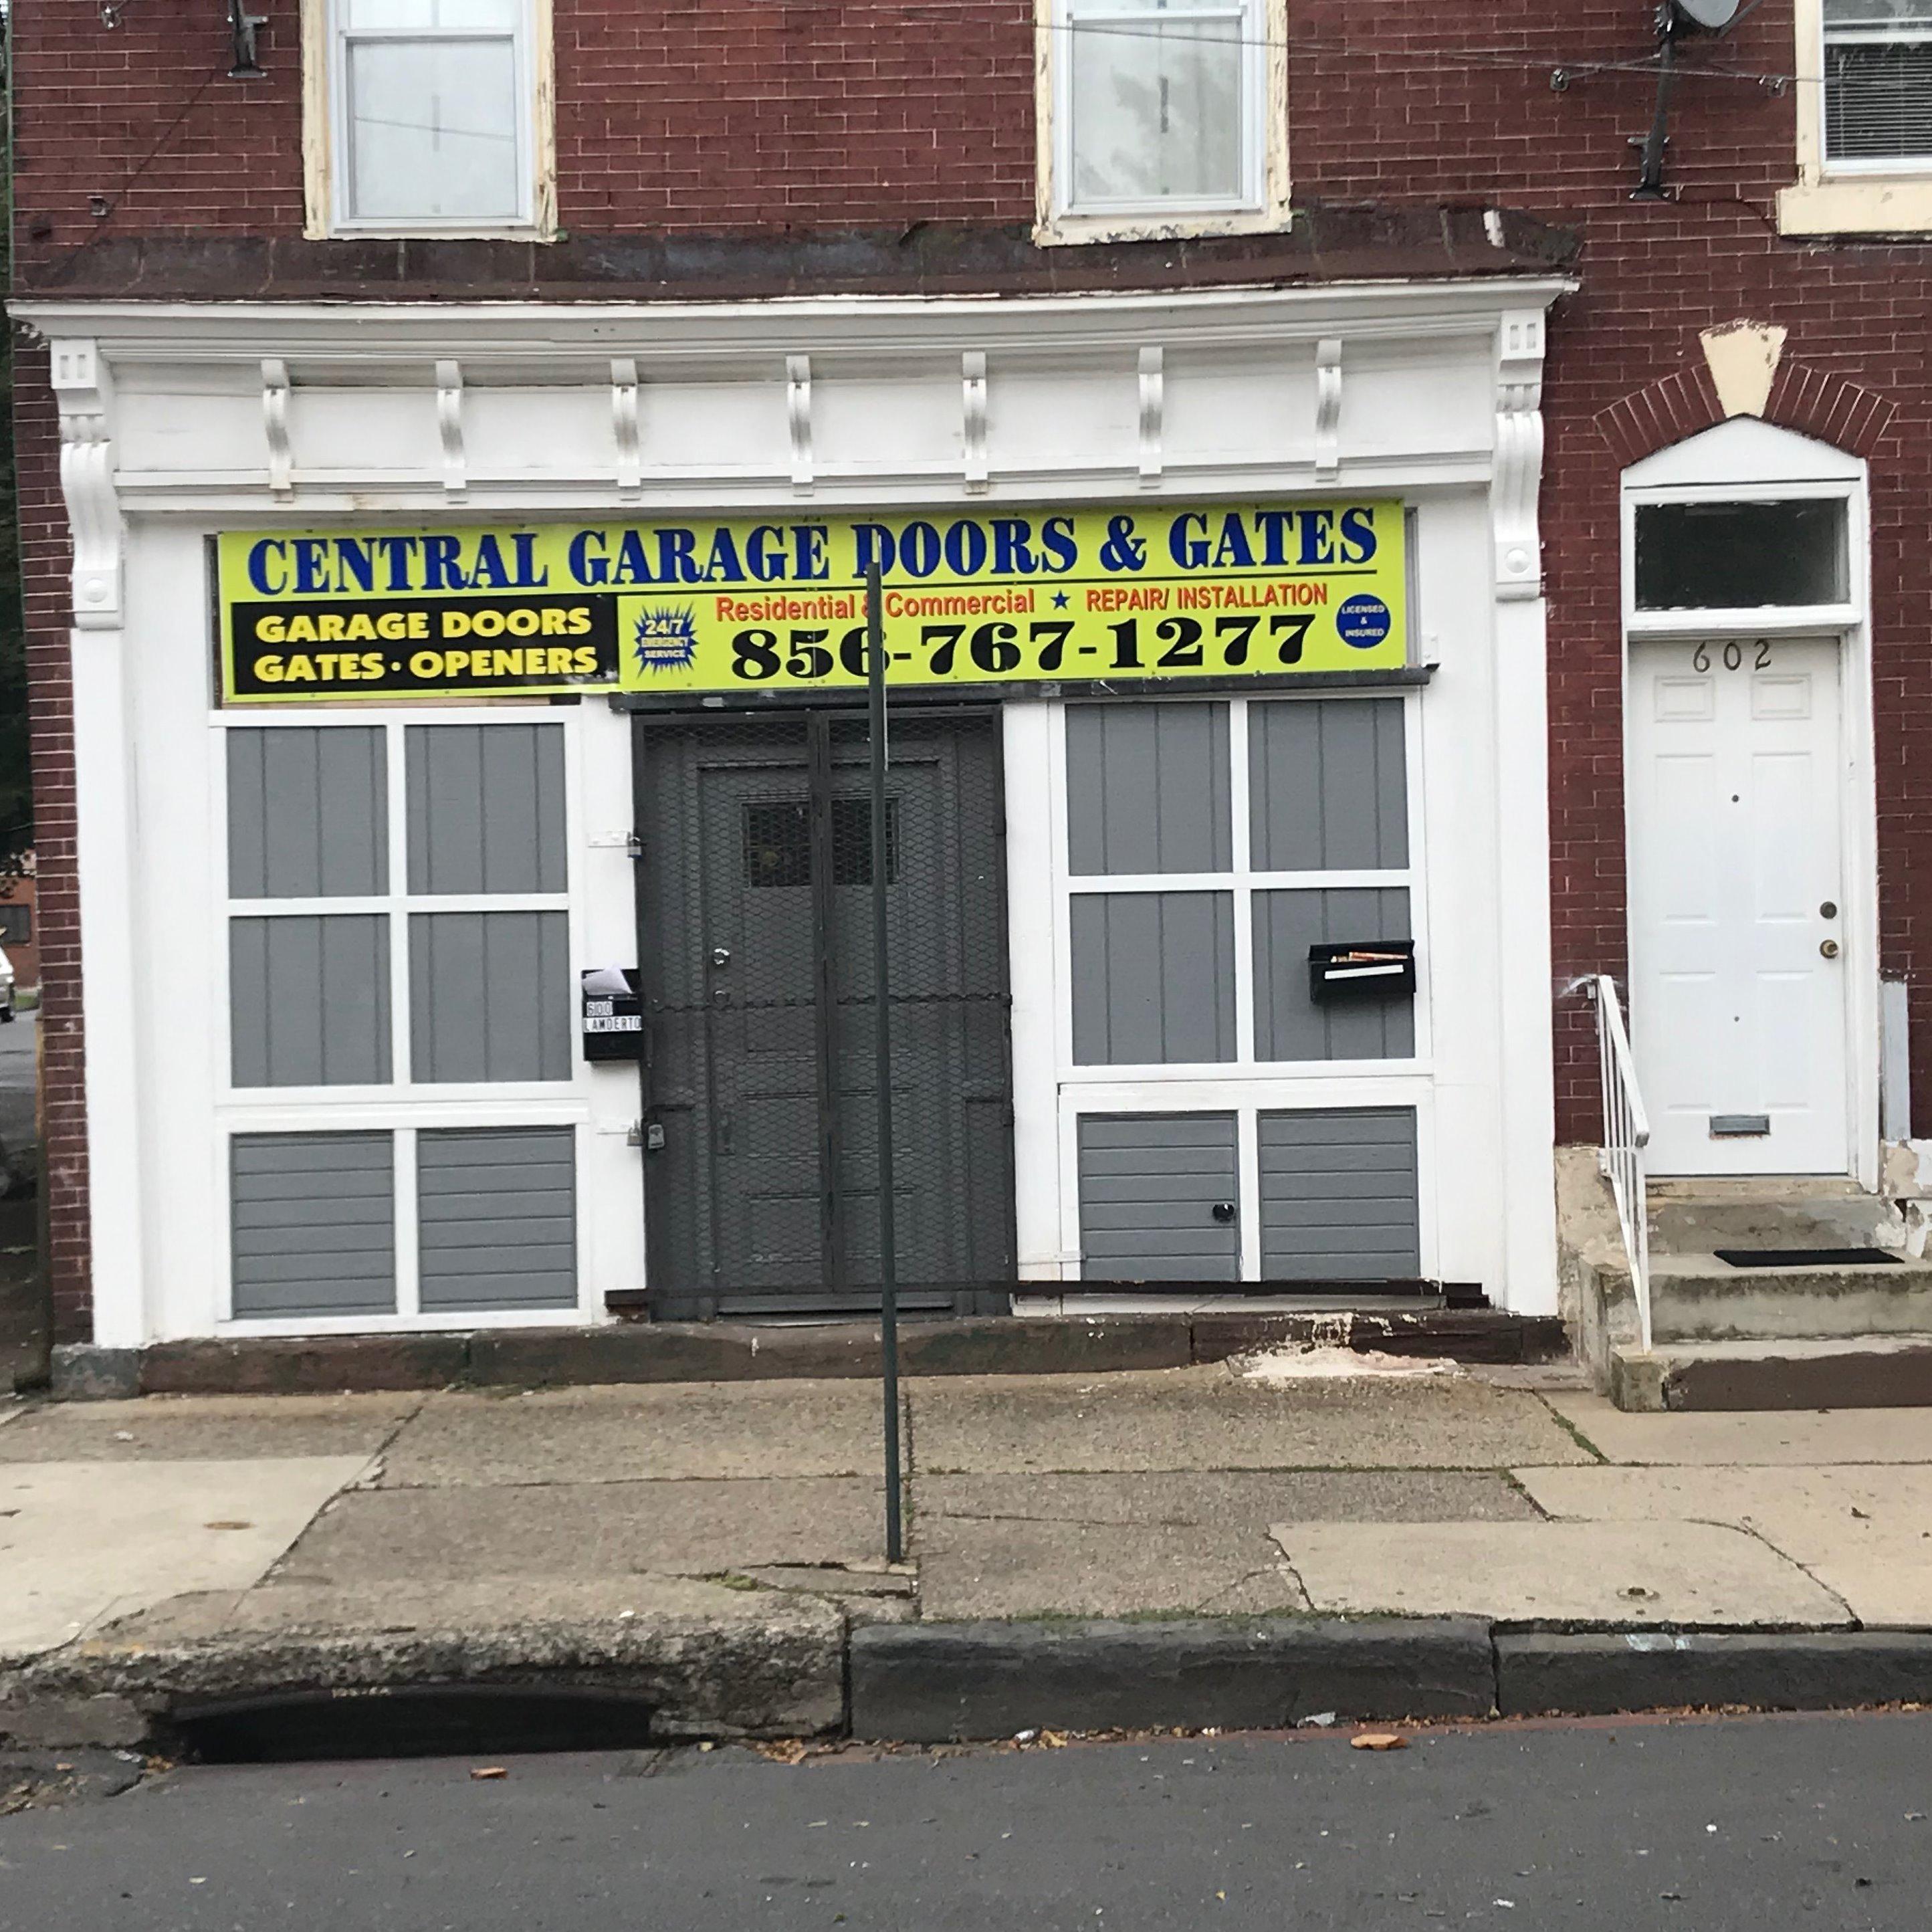 CENTRAL GARAGE DOORS & GATES LLC